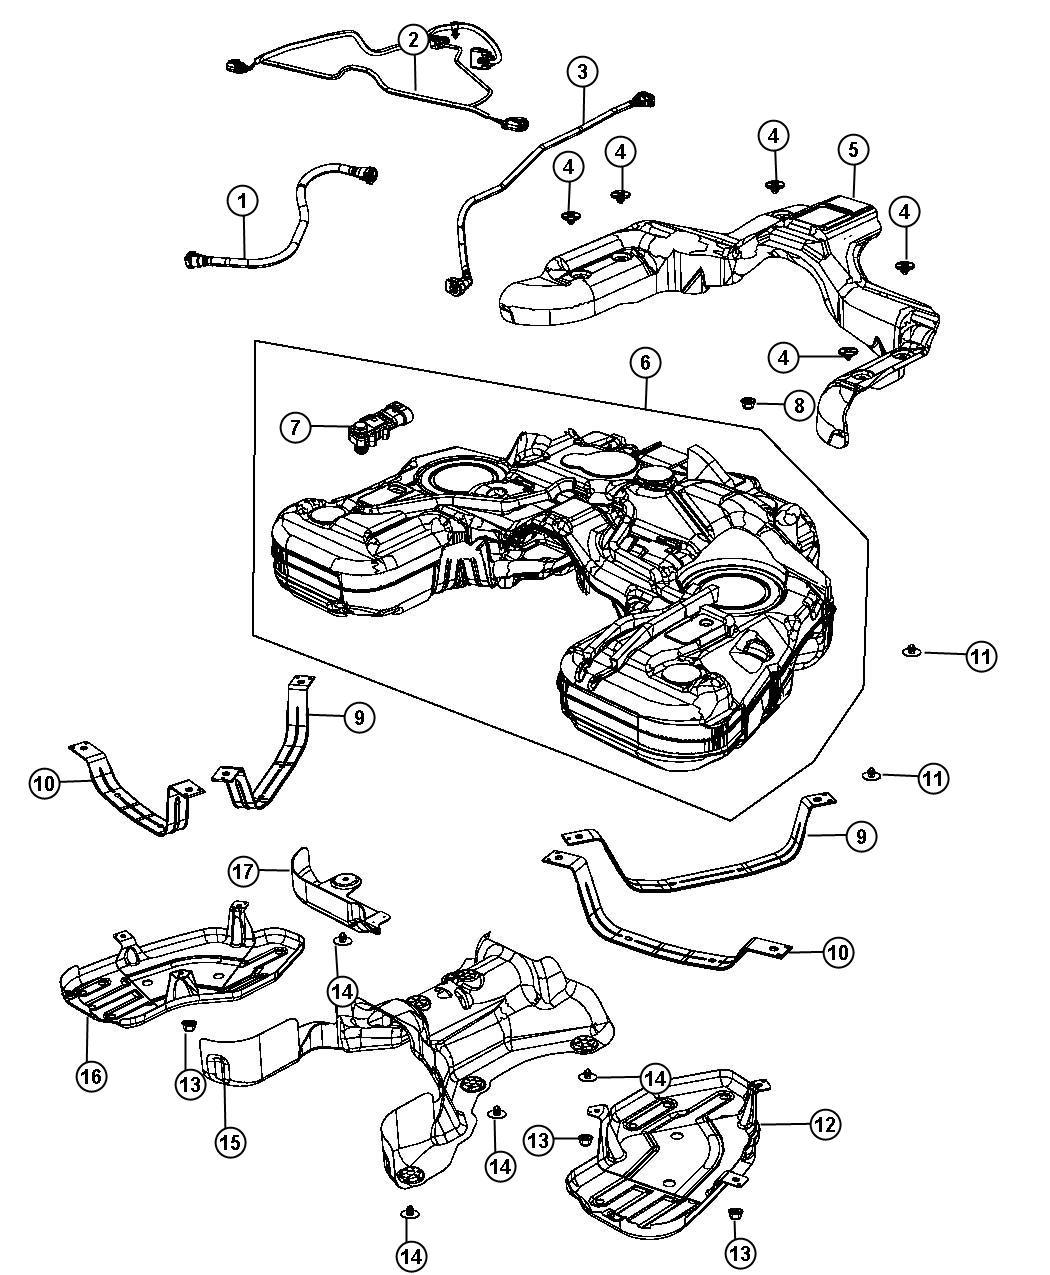 2015 dodge durango wiring  fuel tank jumper   nf4    nf4